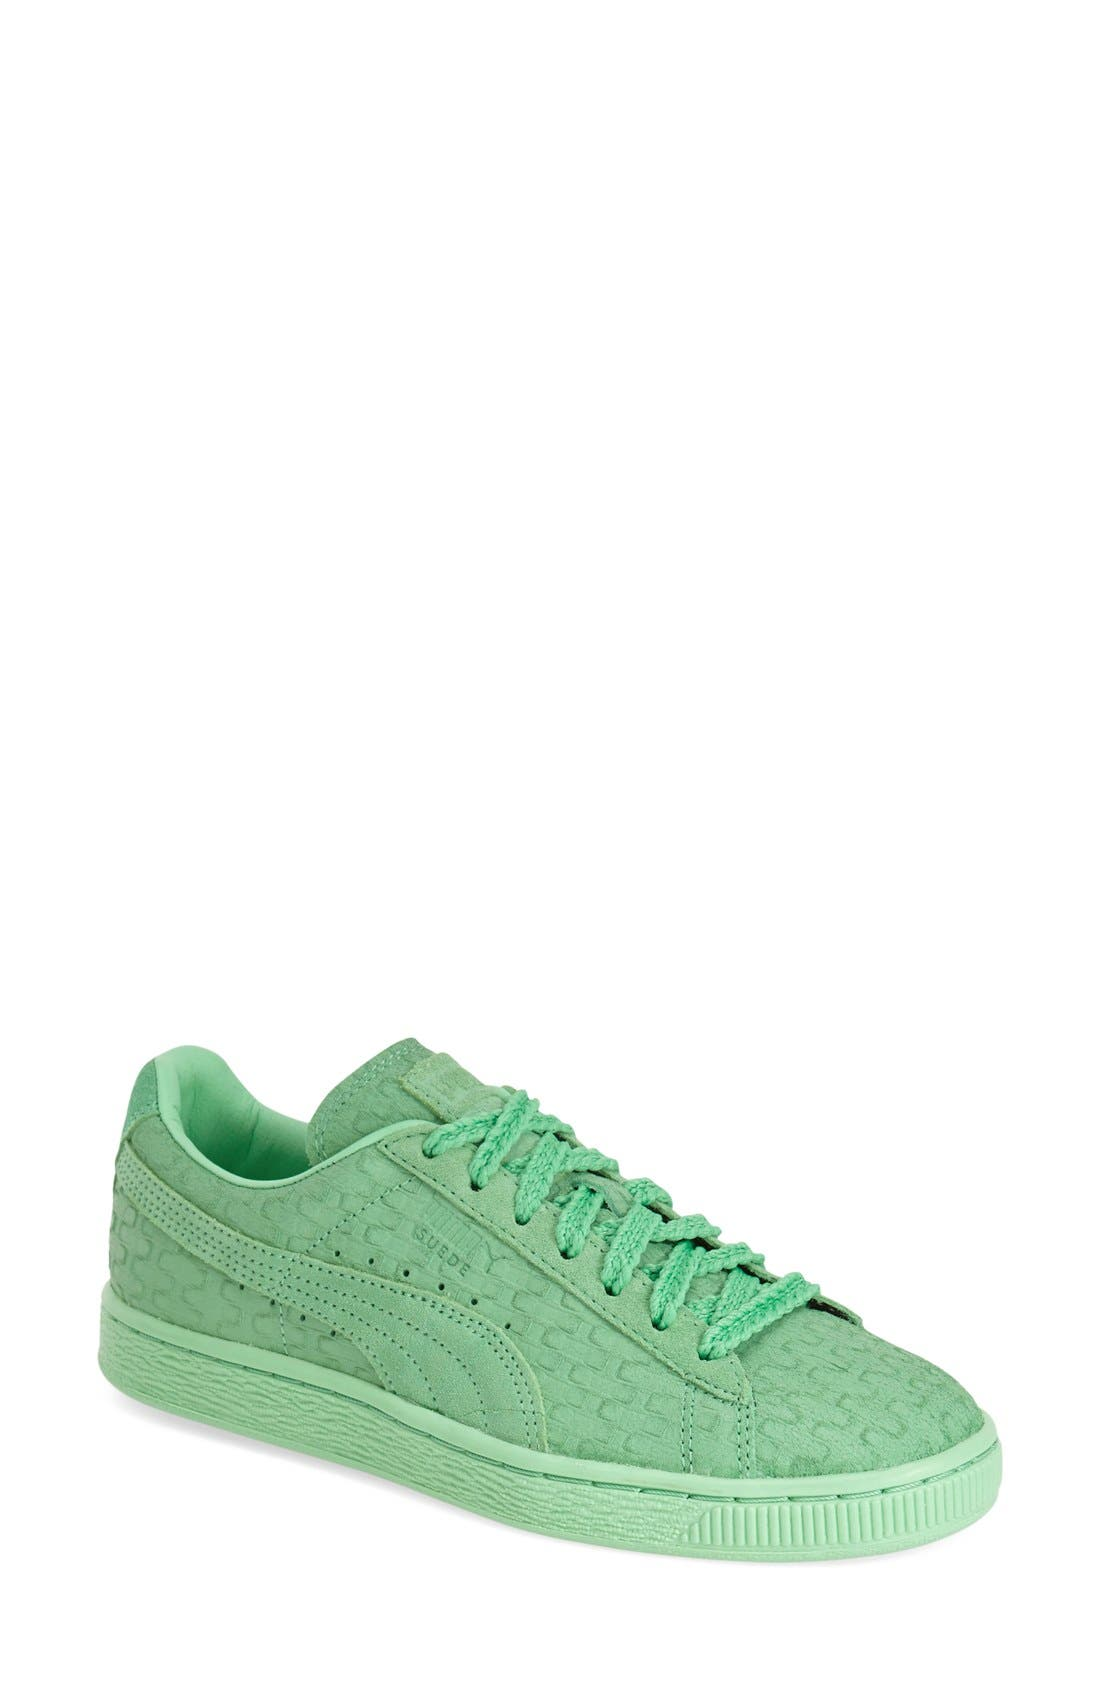 'Suede Classic - Solange' Sneaker, Main, color, 300